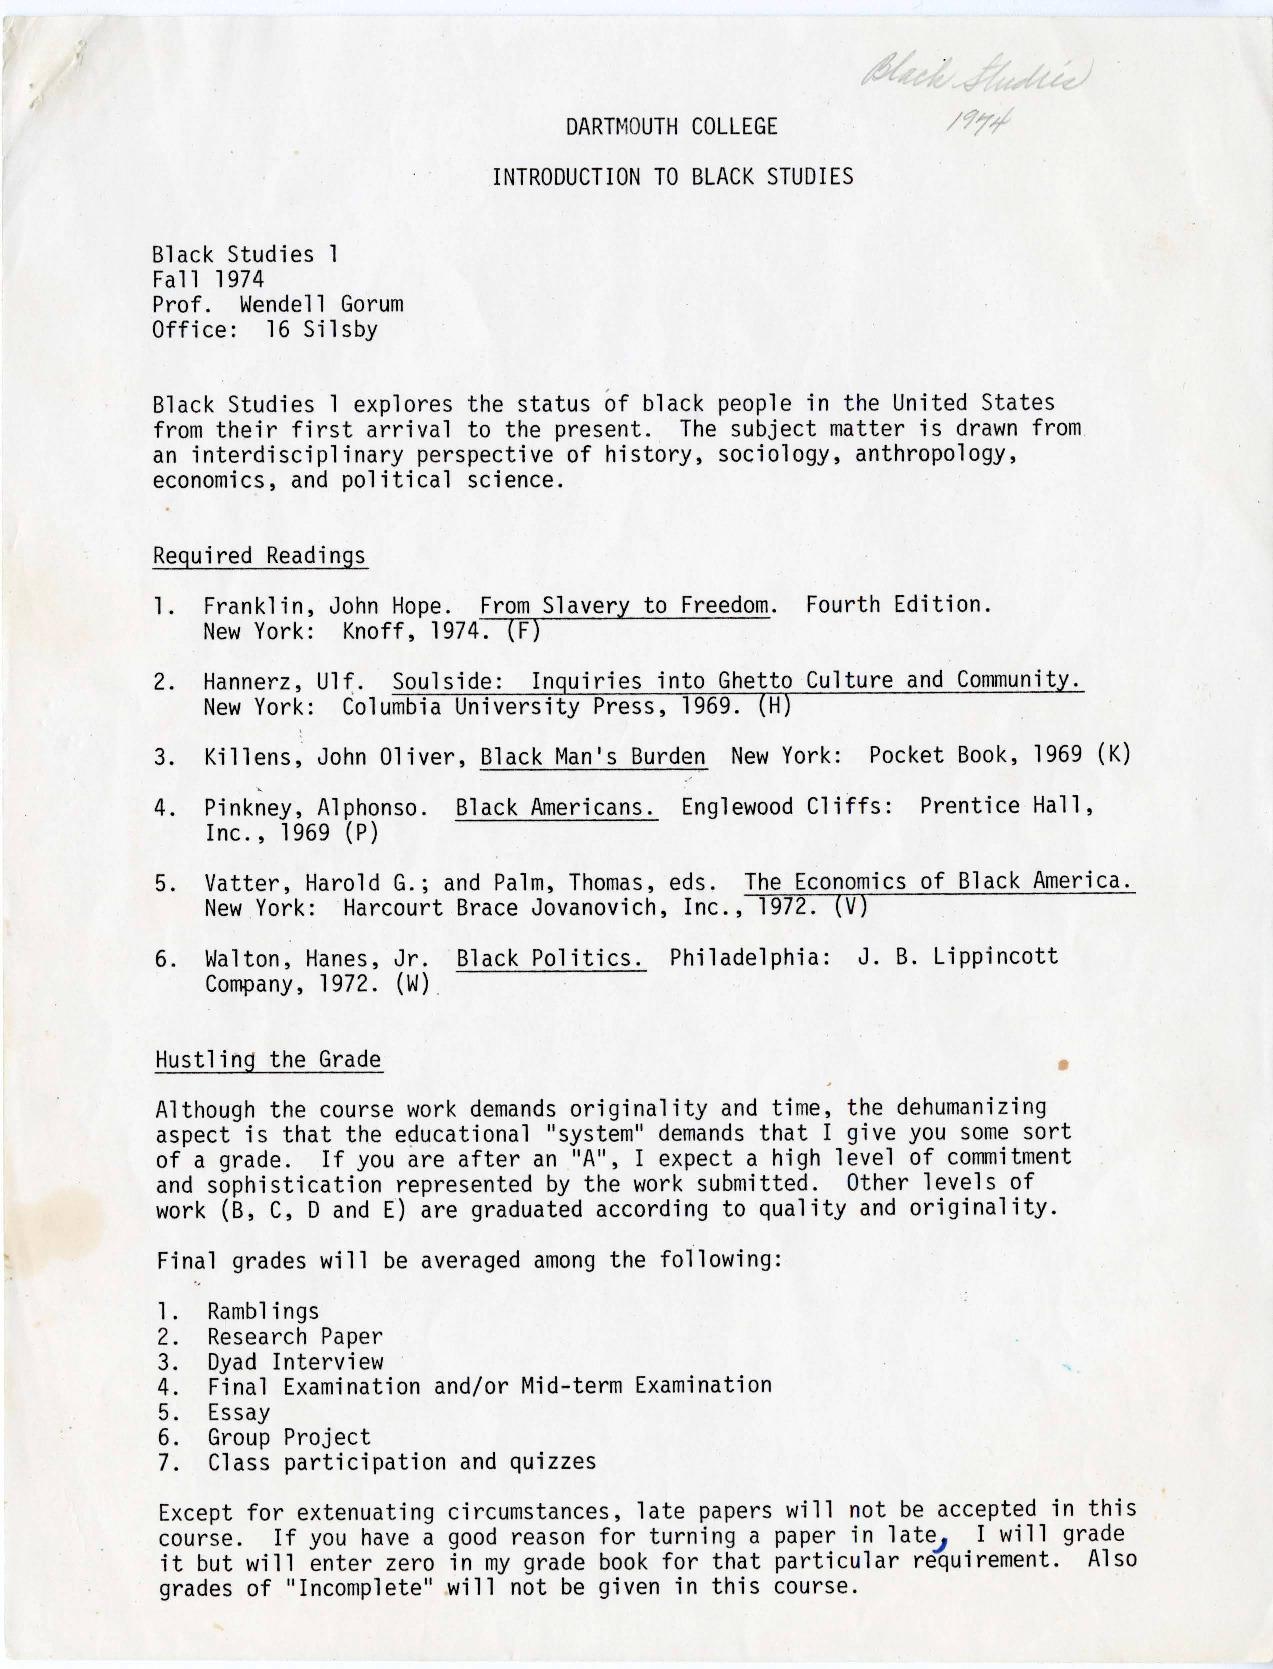 Black Studies 1 syllabus, Fall 1974